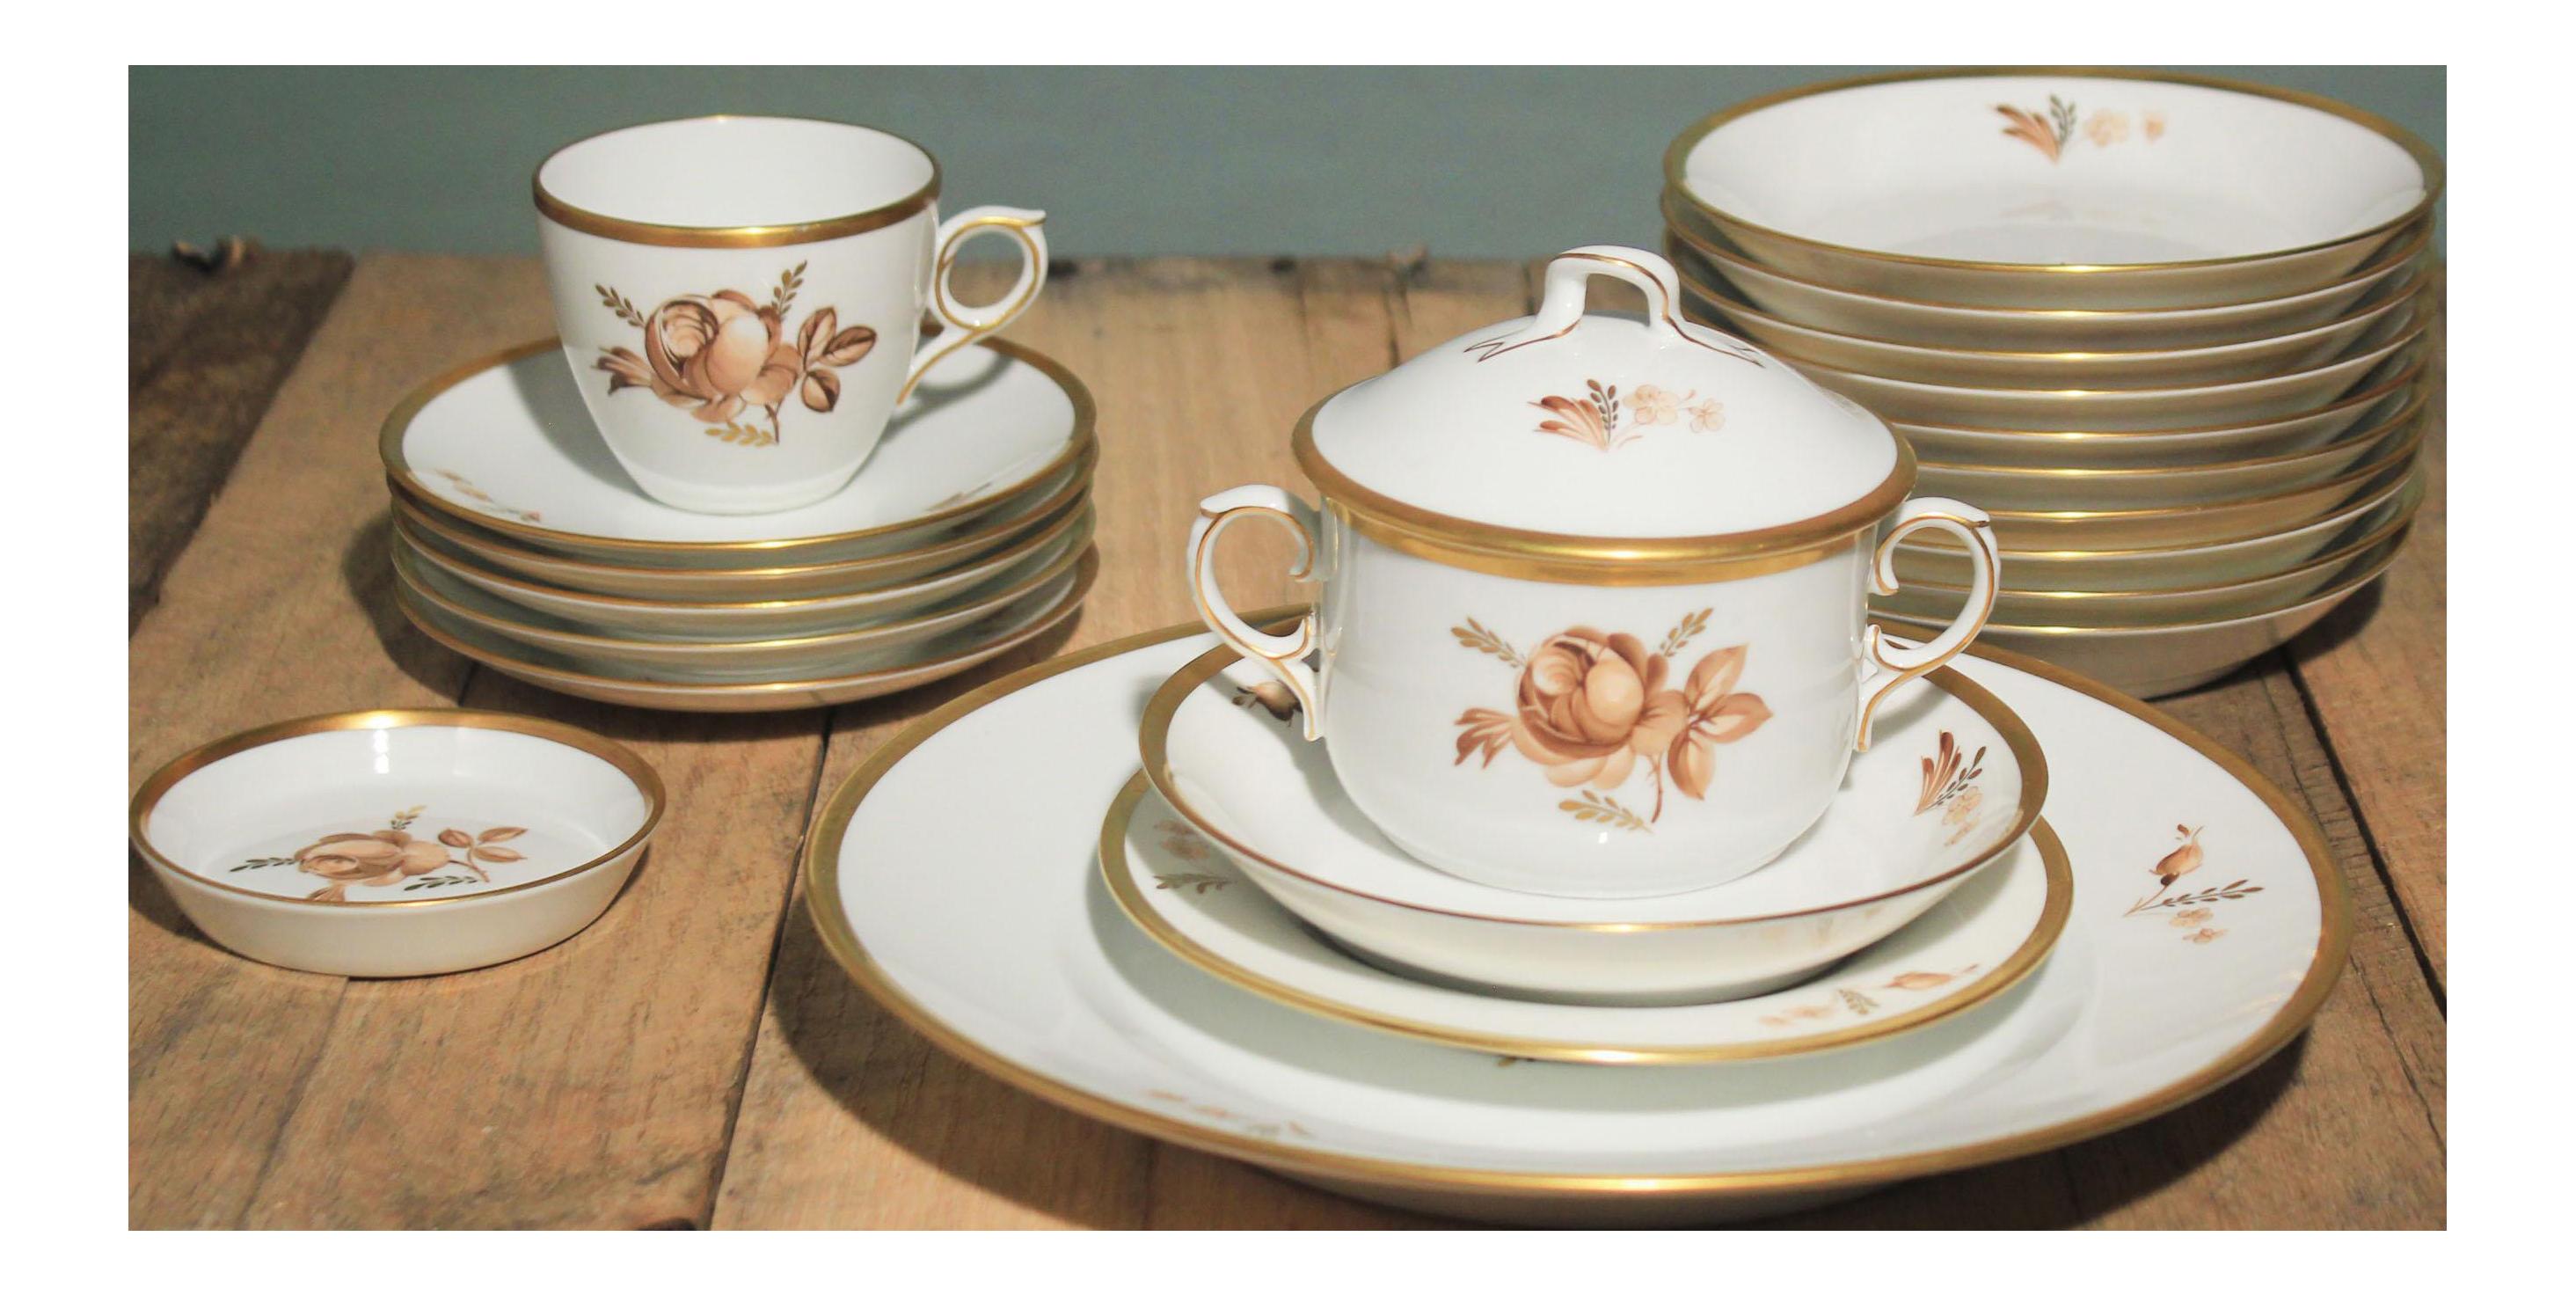 Vintage Royal Copenhagen Porcelain Rose \u0026 Gold Dinnerware  sc 1 st  Chairish & Vintage Royal Copenhagen Porcelain Rose \u0026 Gold Dinnerware | Chairish